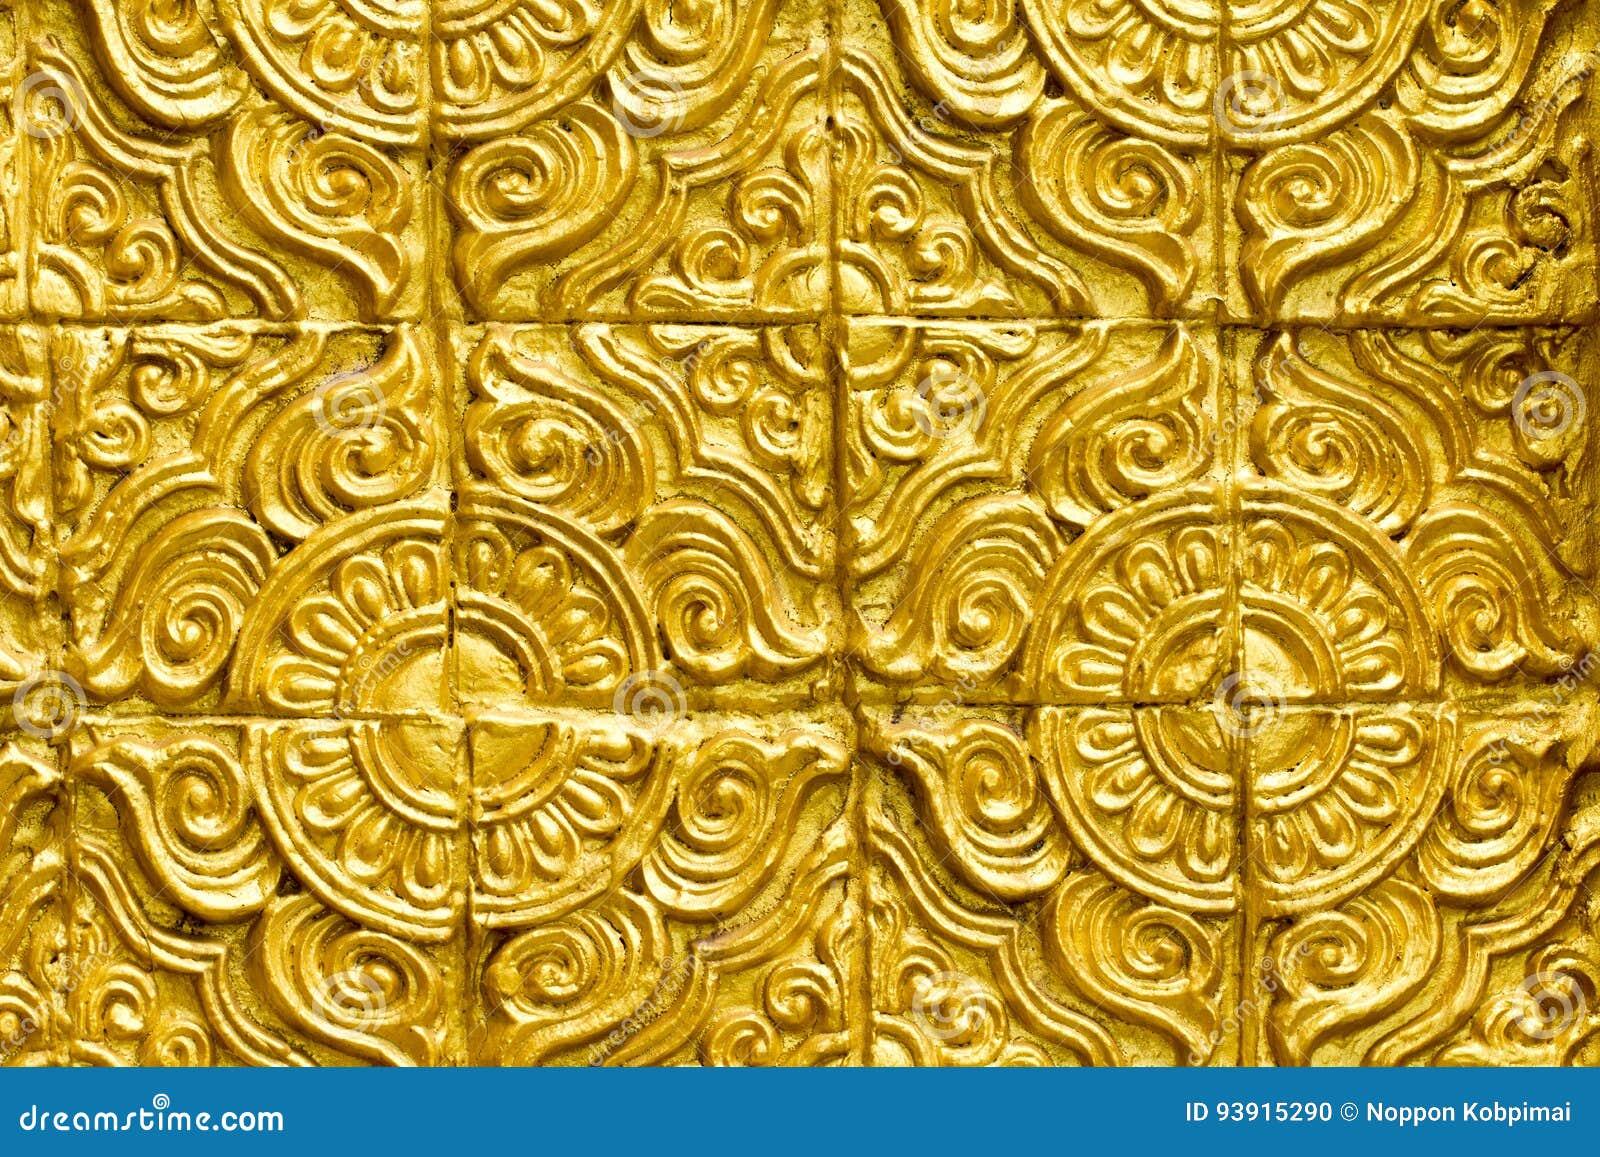 Thai Golden Wall Beautiful Design Texture Stock Photo